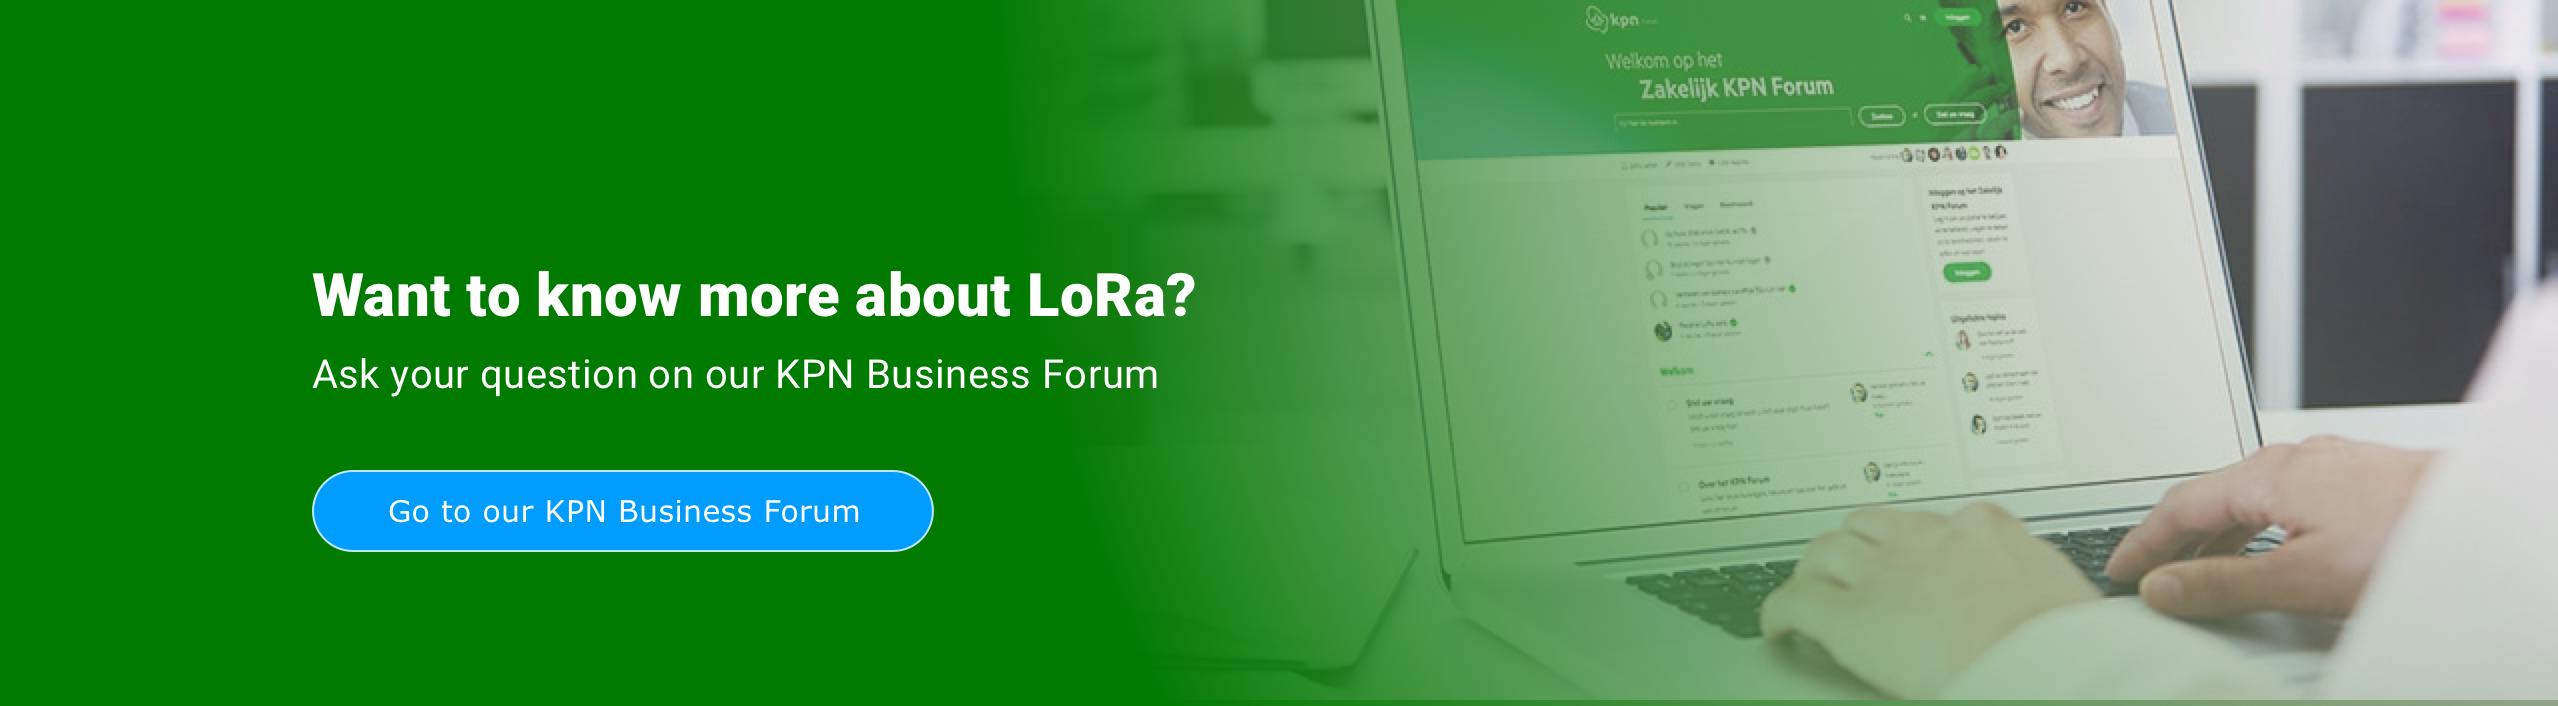 lora-kpn-forum